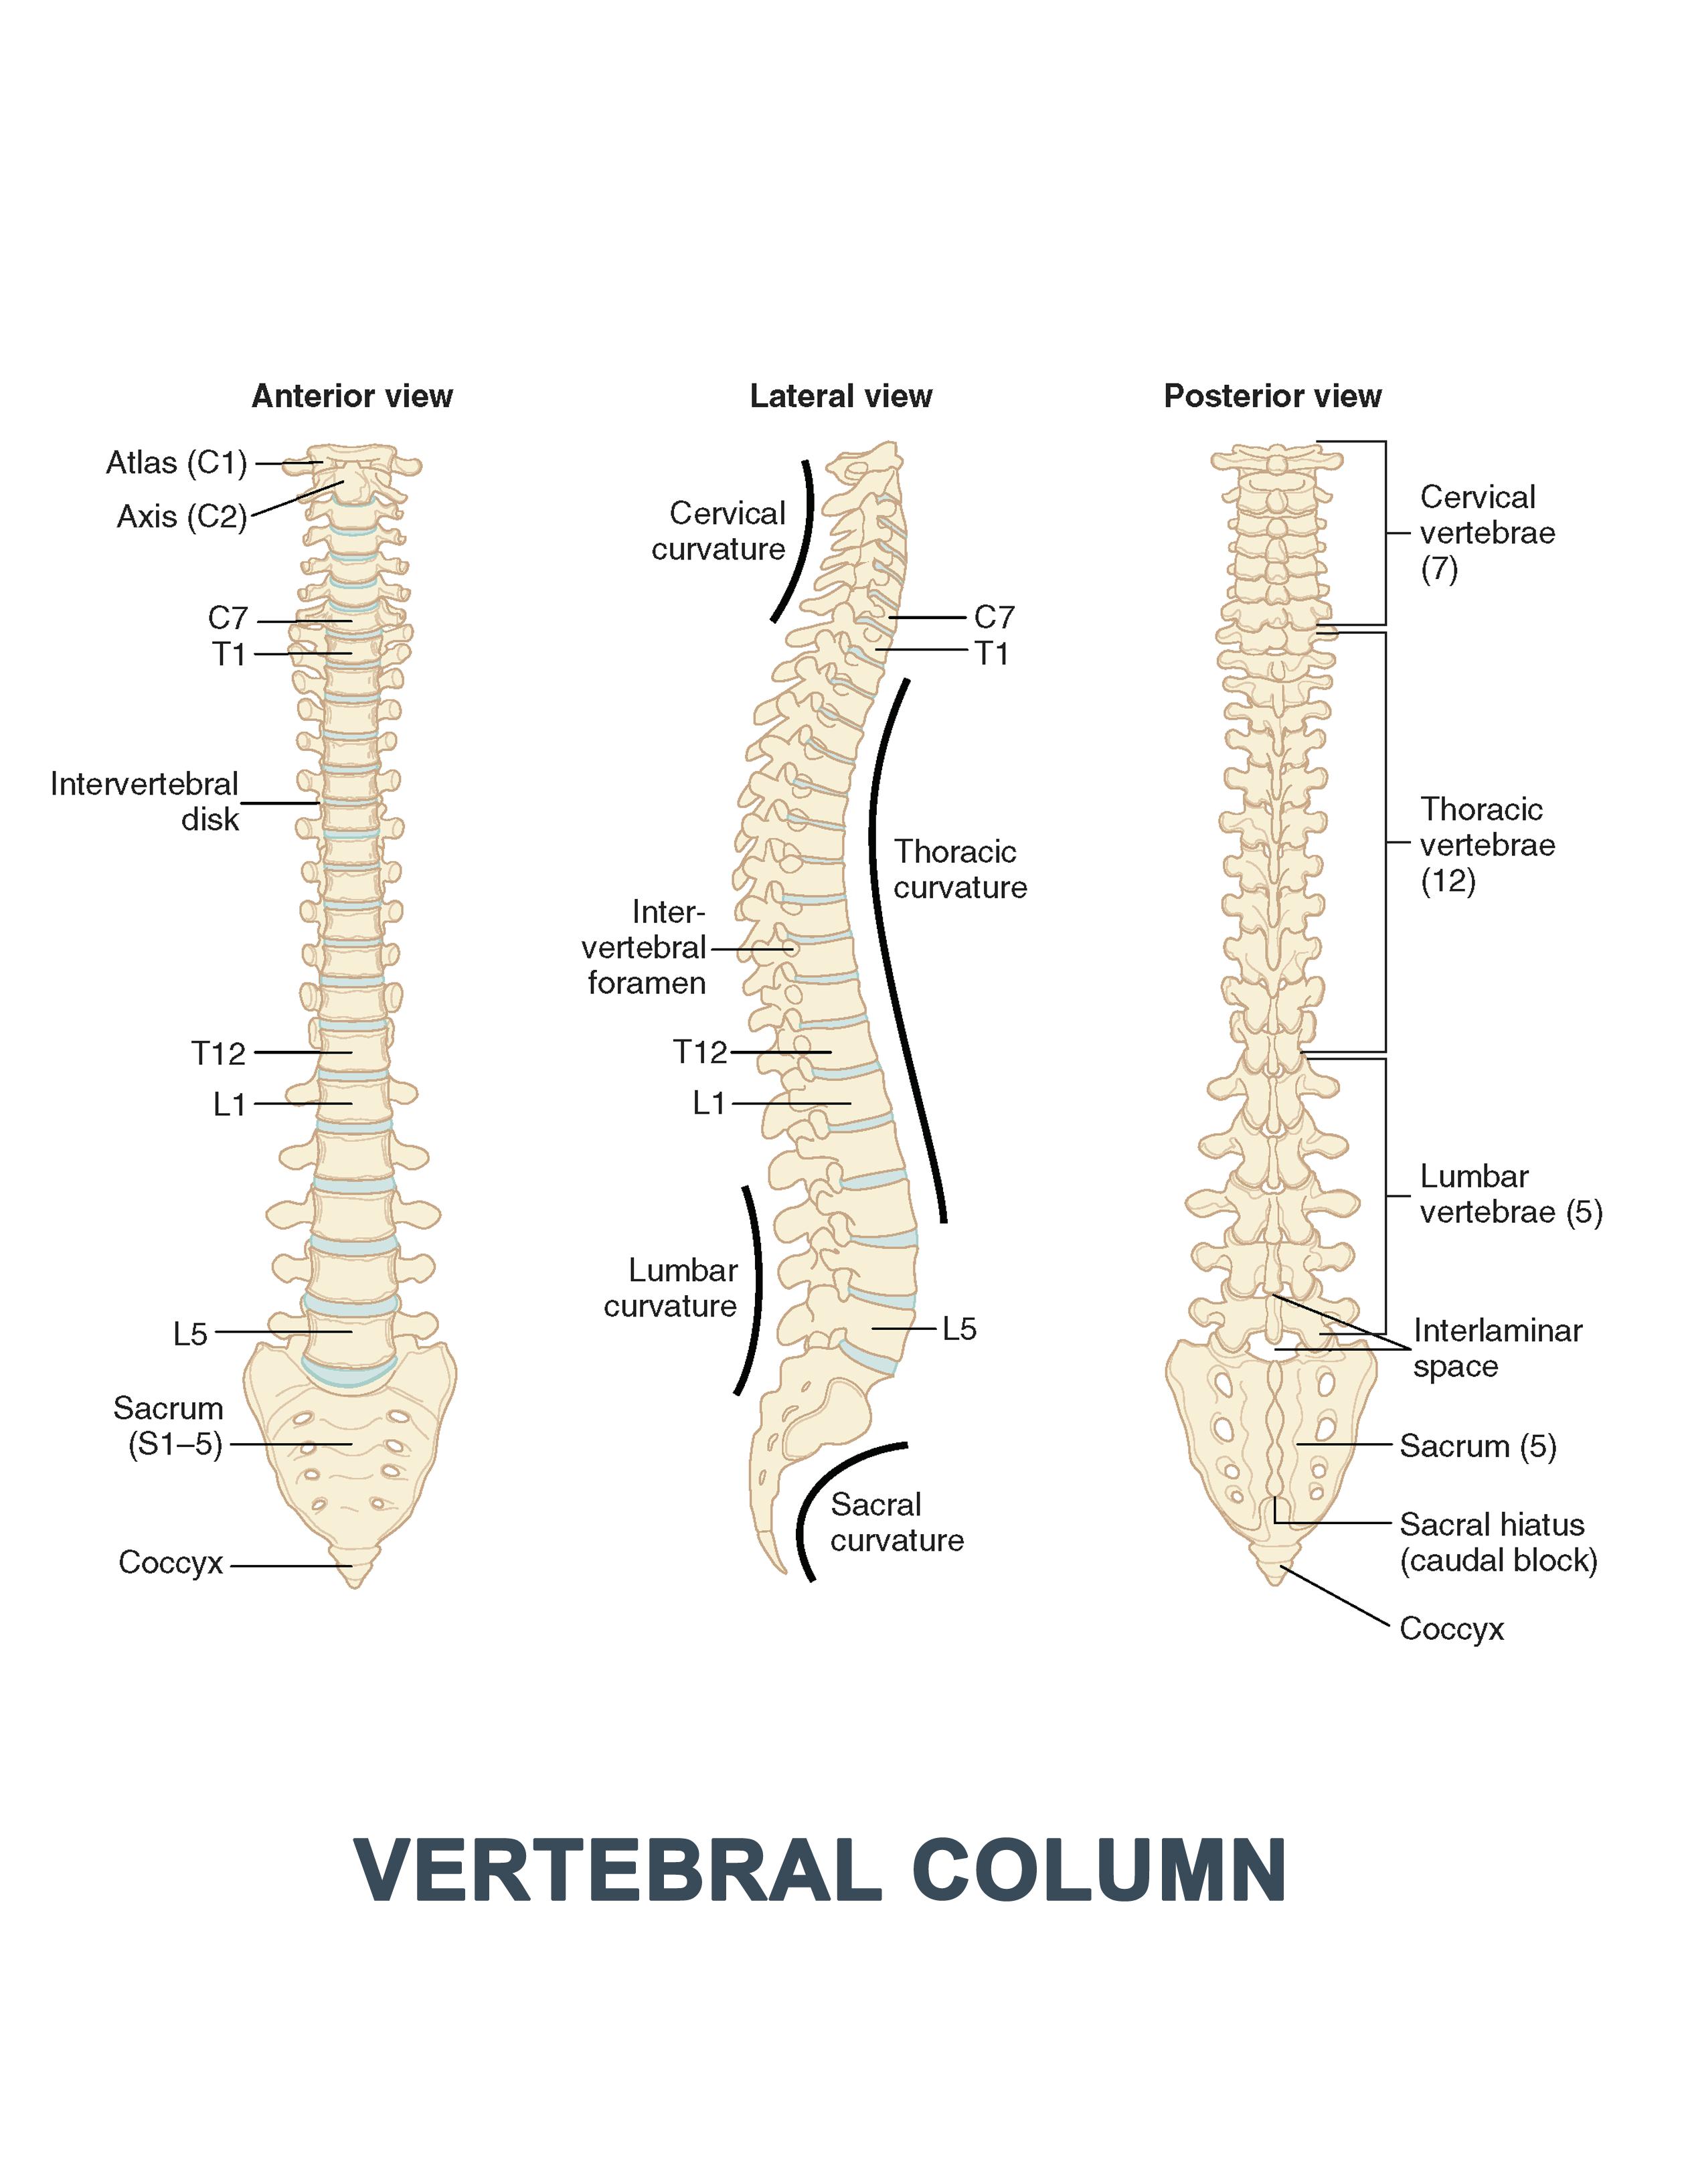 Vertebral Column - #anatomy images illustrations #anatomy images ...